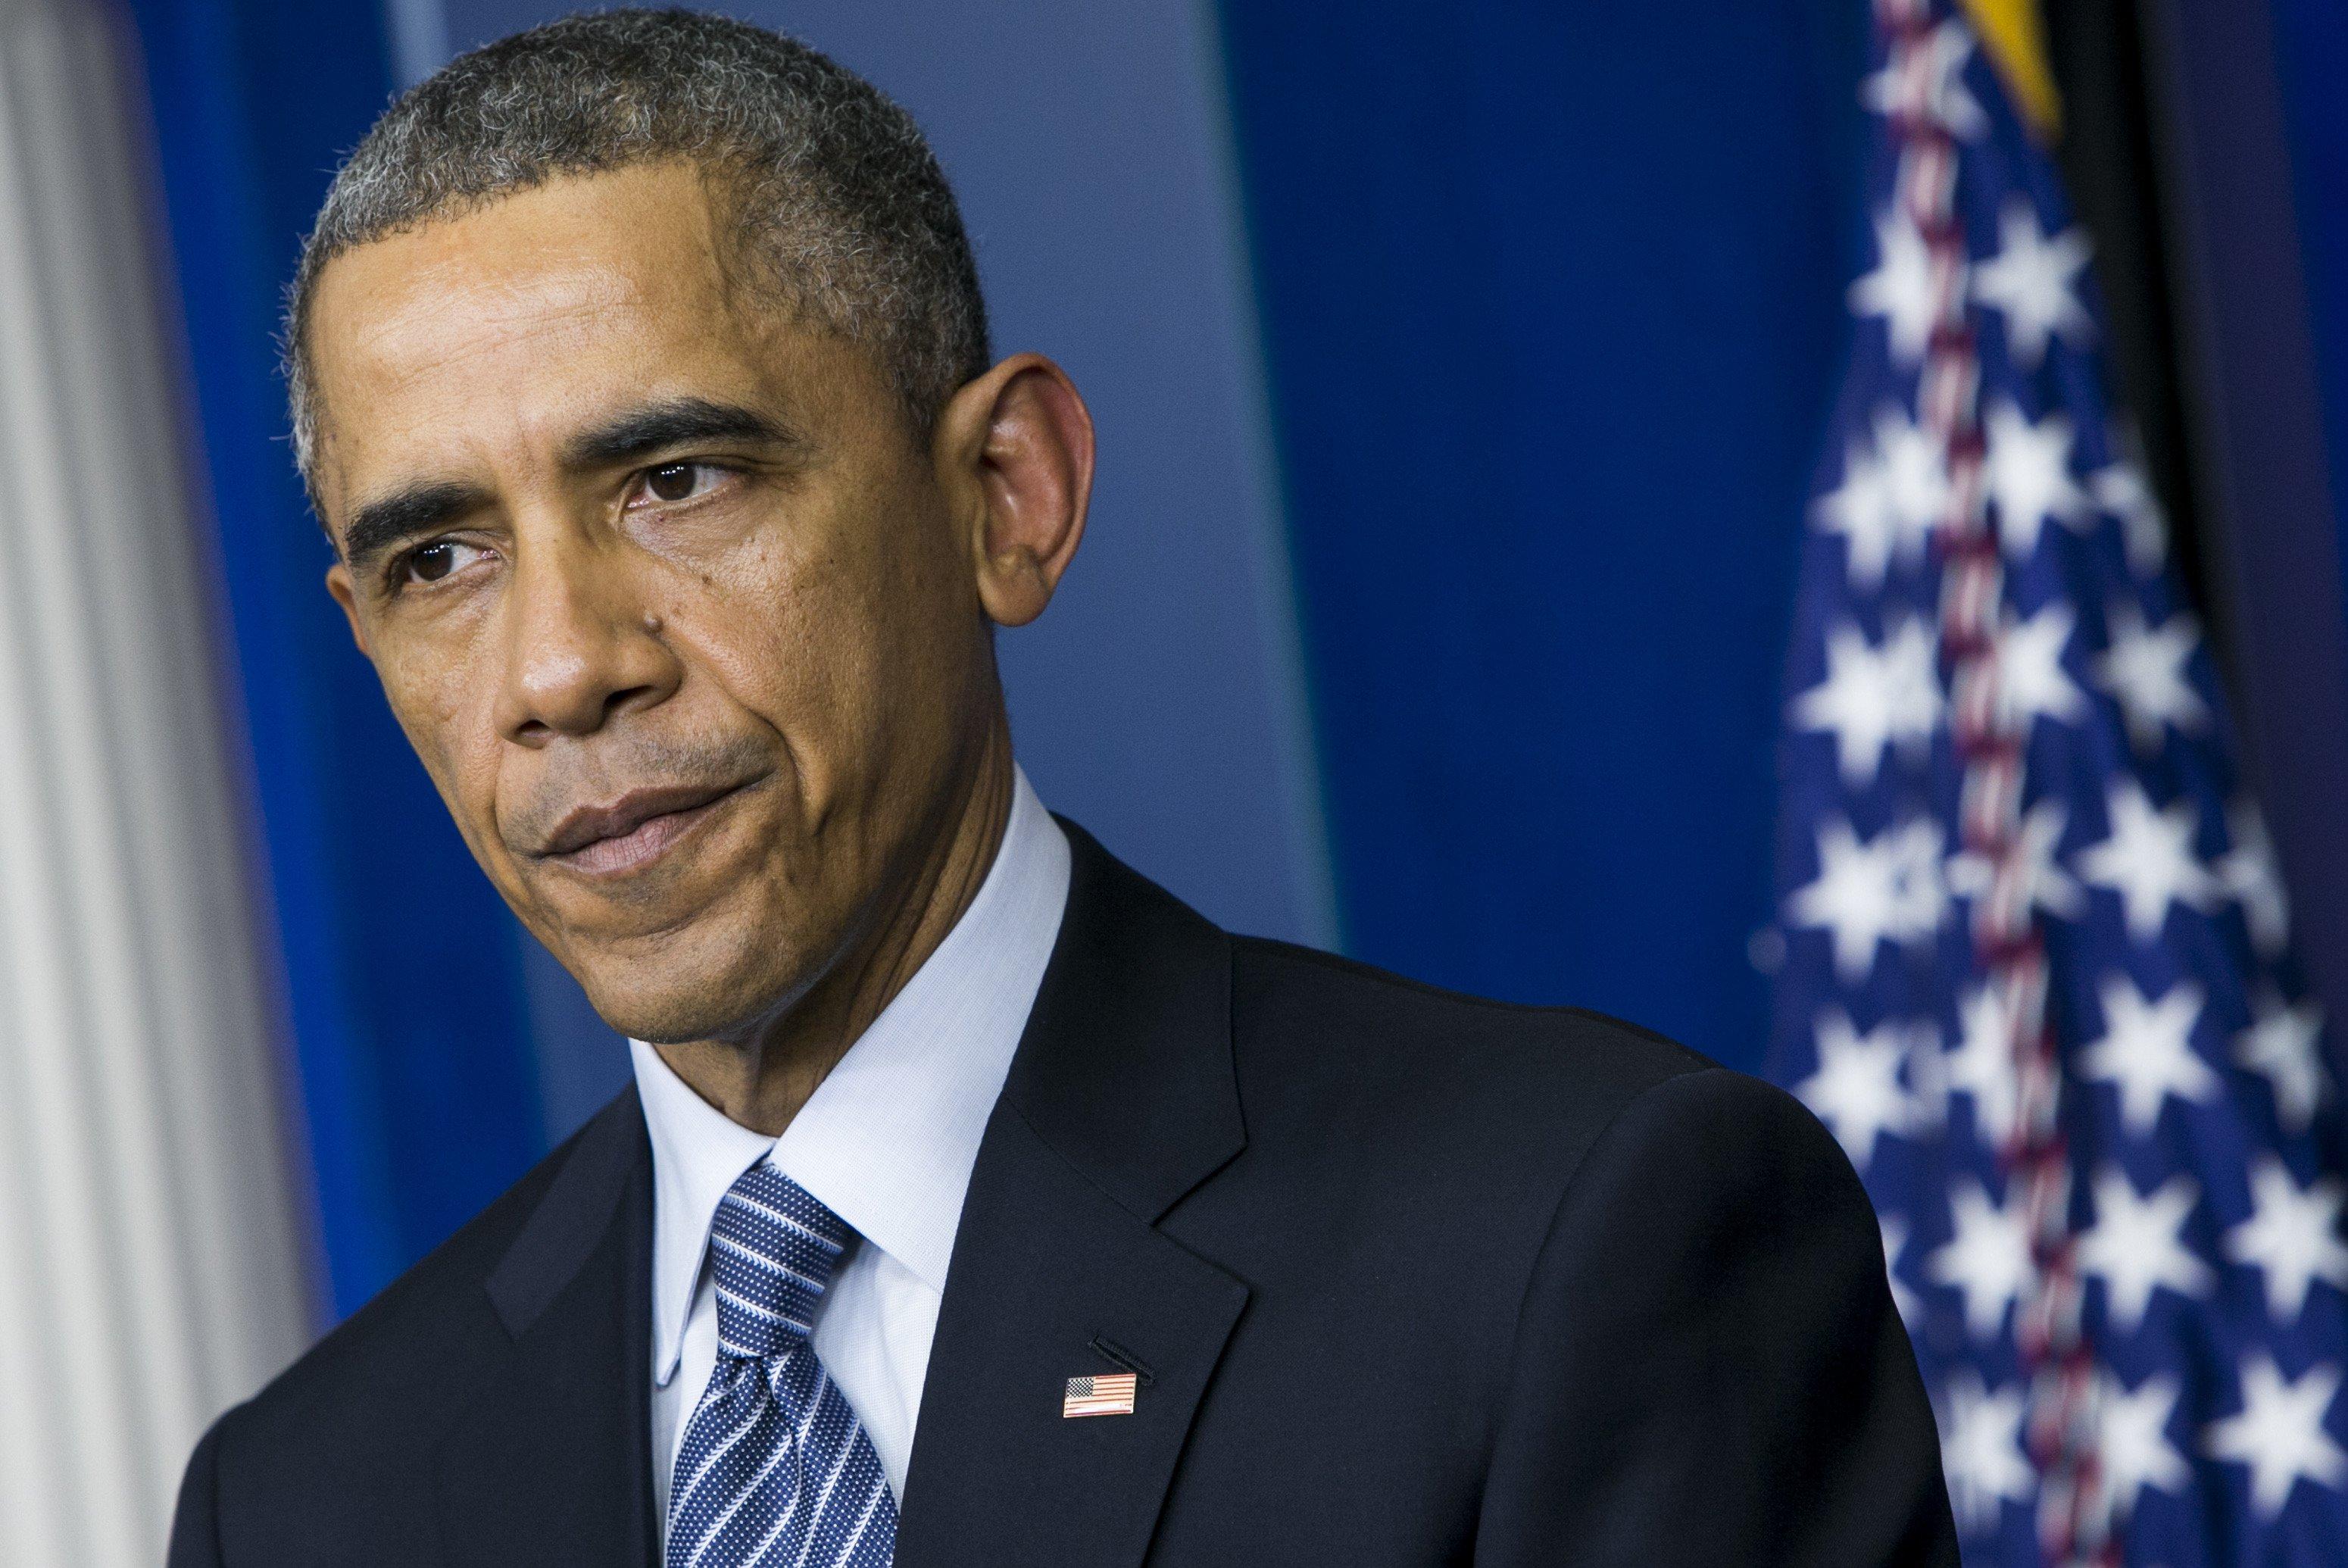 President Barack Obama delivers remarks at the White House in Washington, D.C. on Nov. 24, 2014.